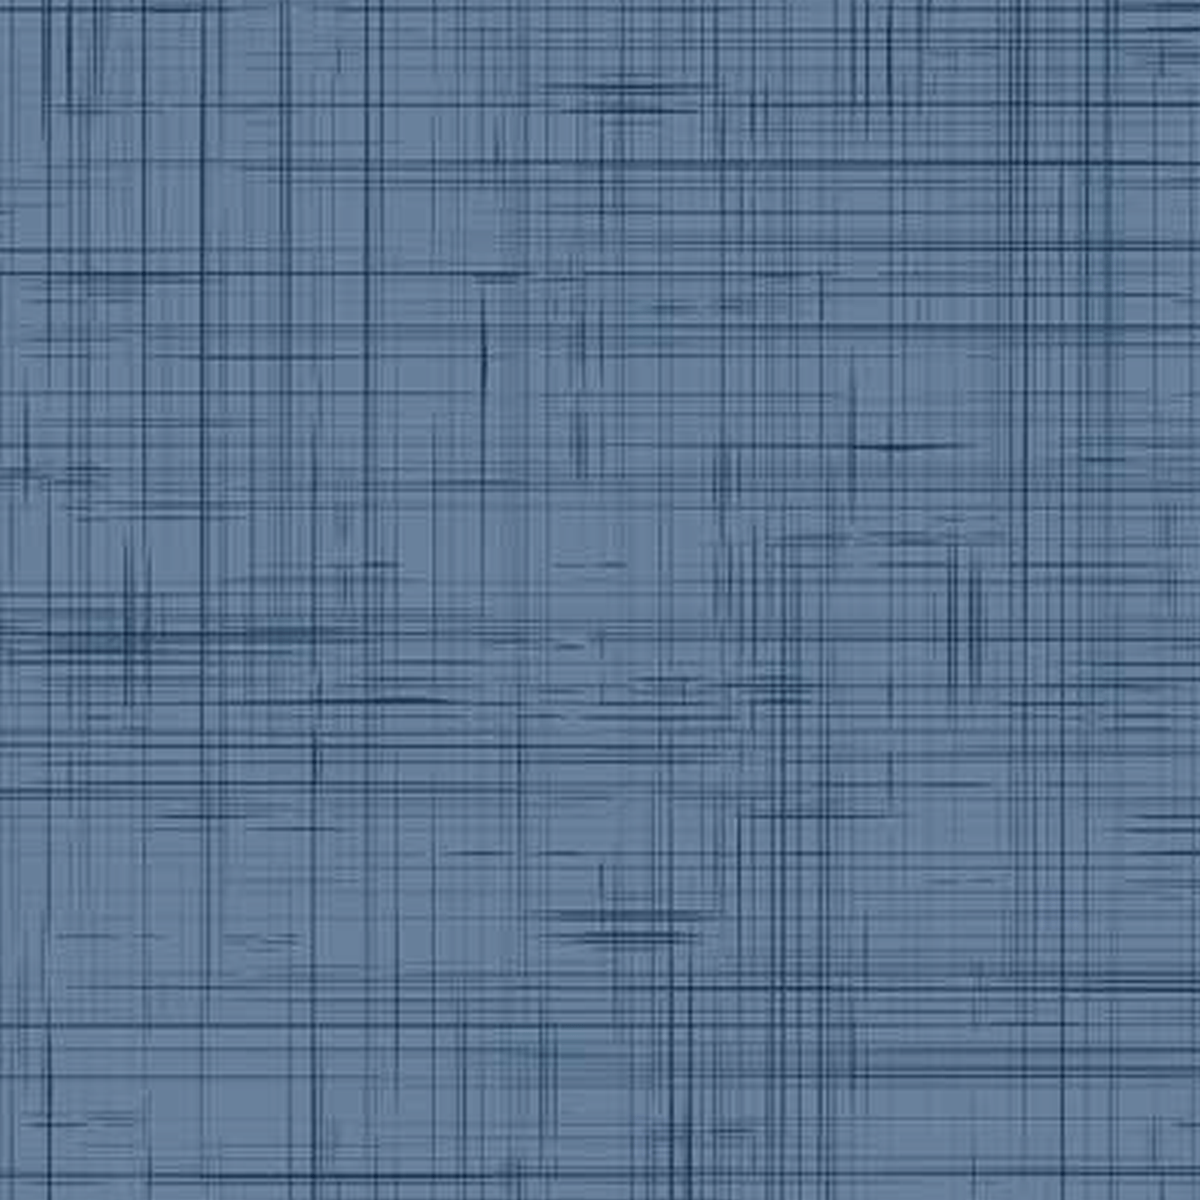 Tecido Tricoline Azul Jeans Textura